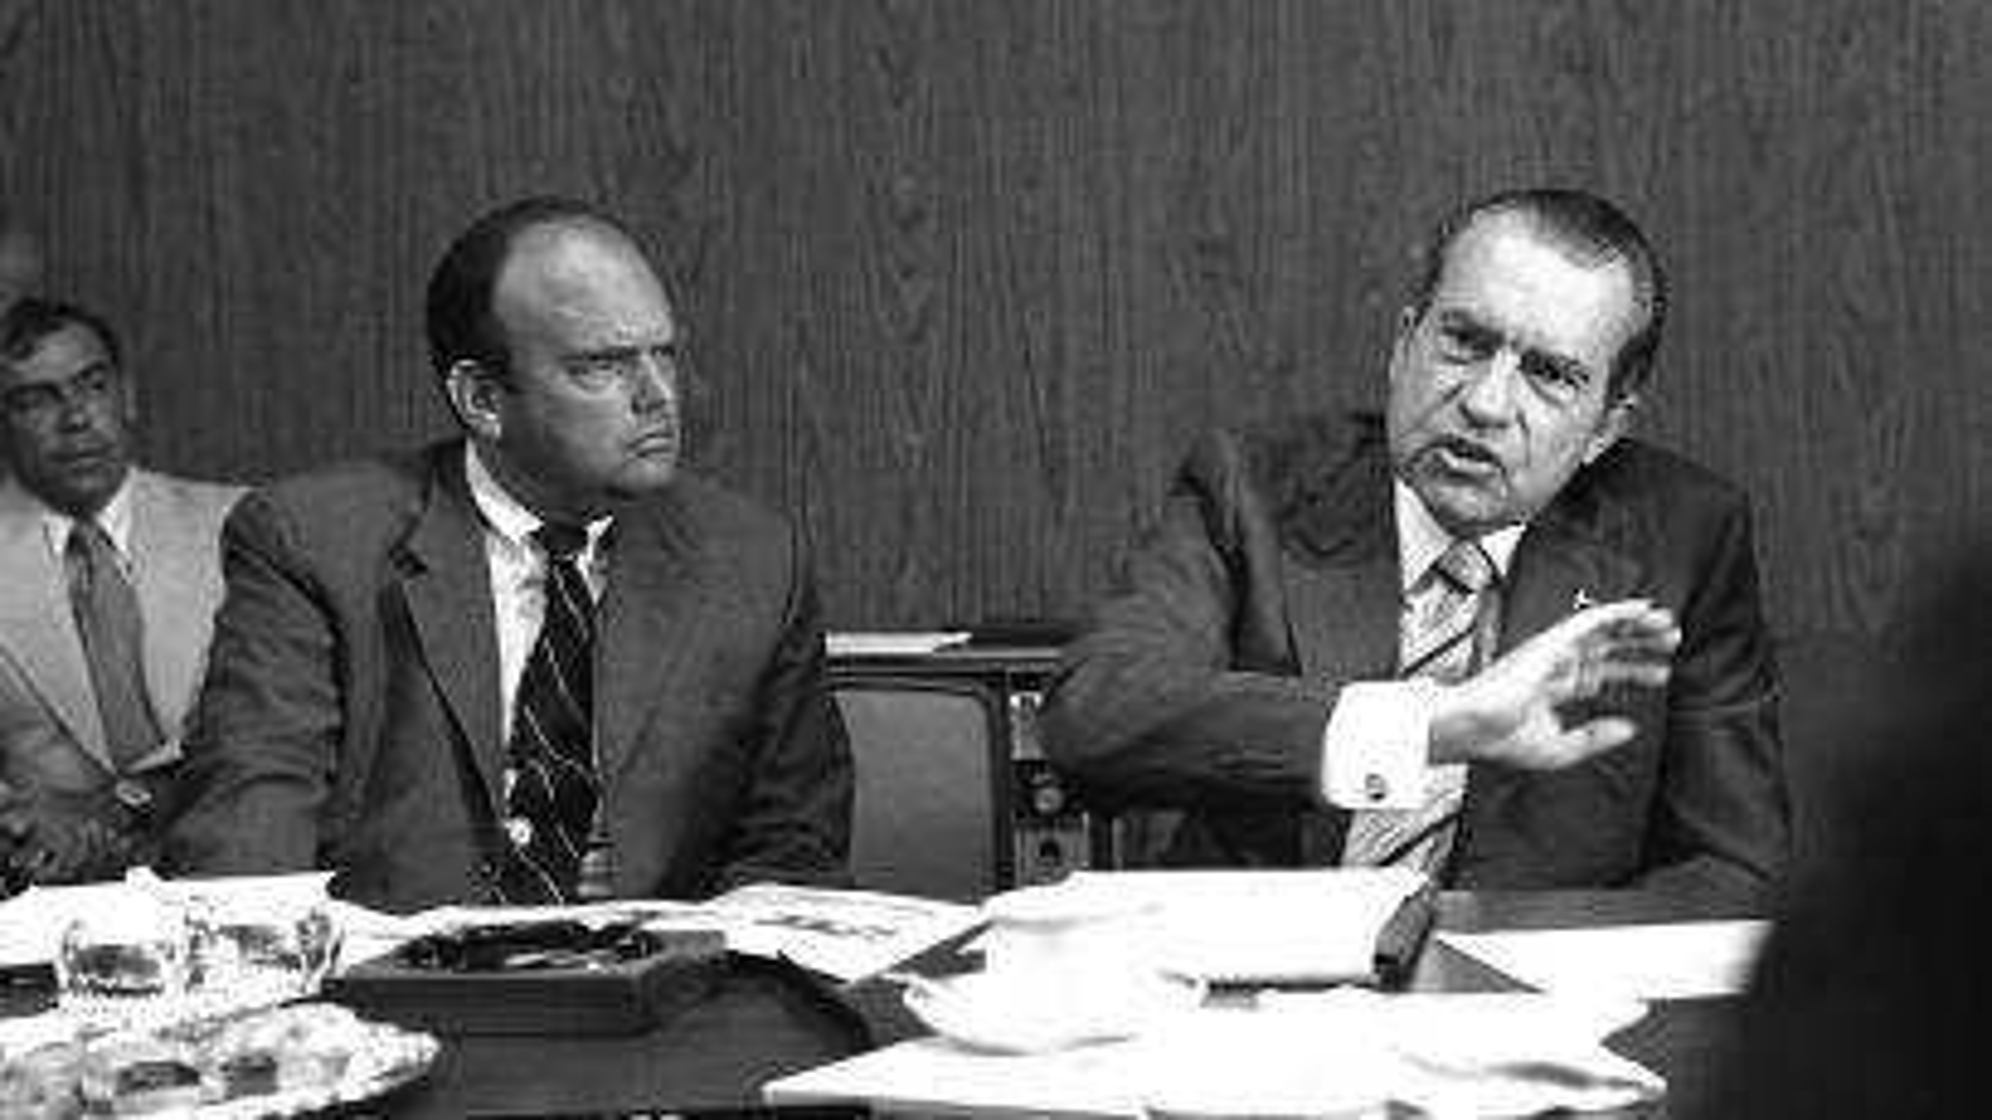 Black Students In Us Get Criminalized >> Nixon Advisor We Created The War On Drugs To Criminalize Black